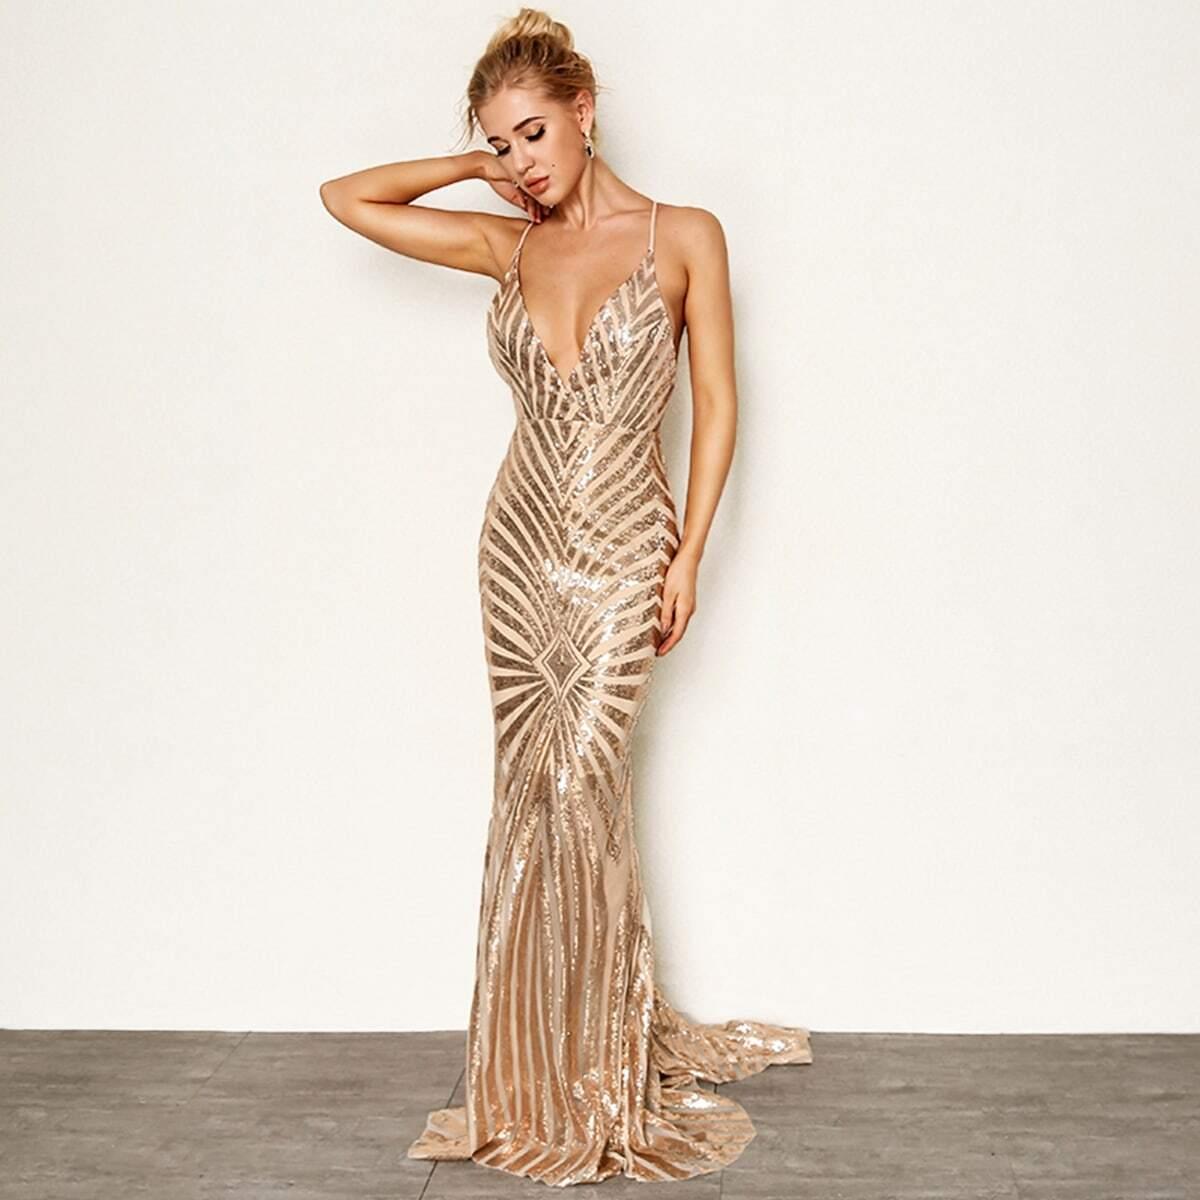 Crisscross Open Back Fishtail Metallic Sequin Dress